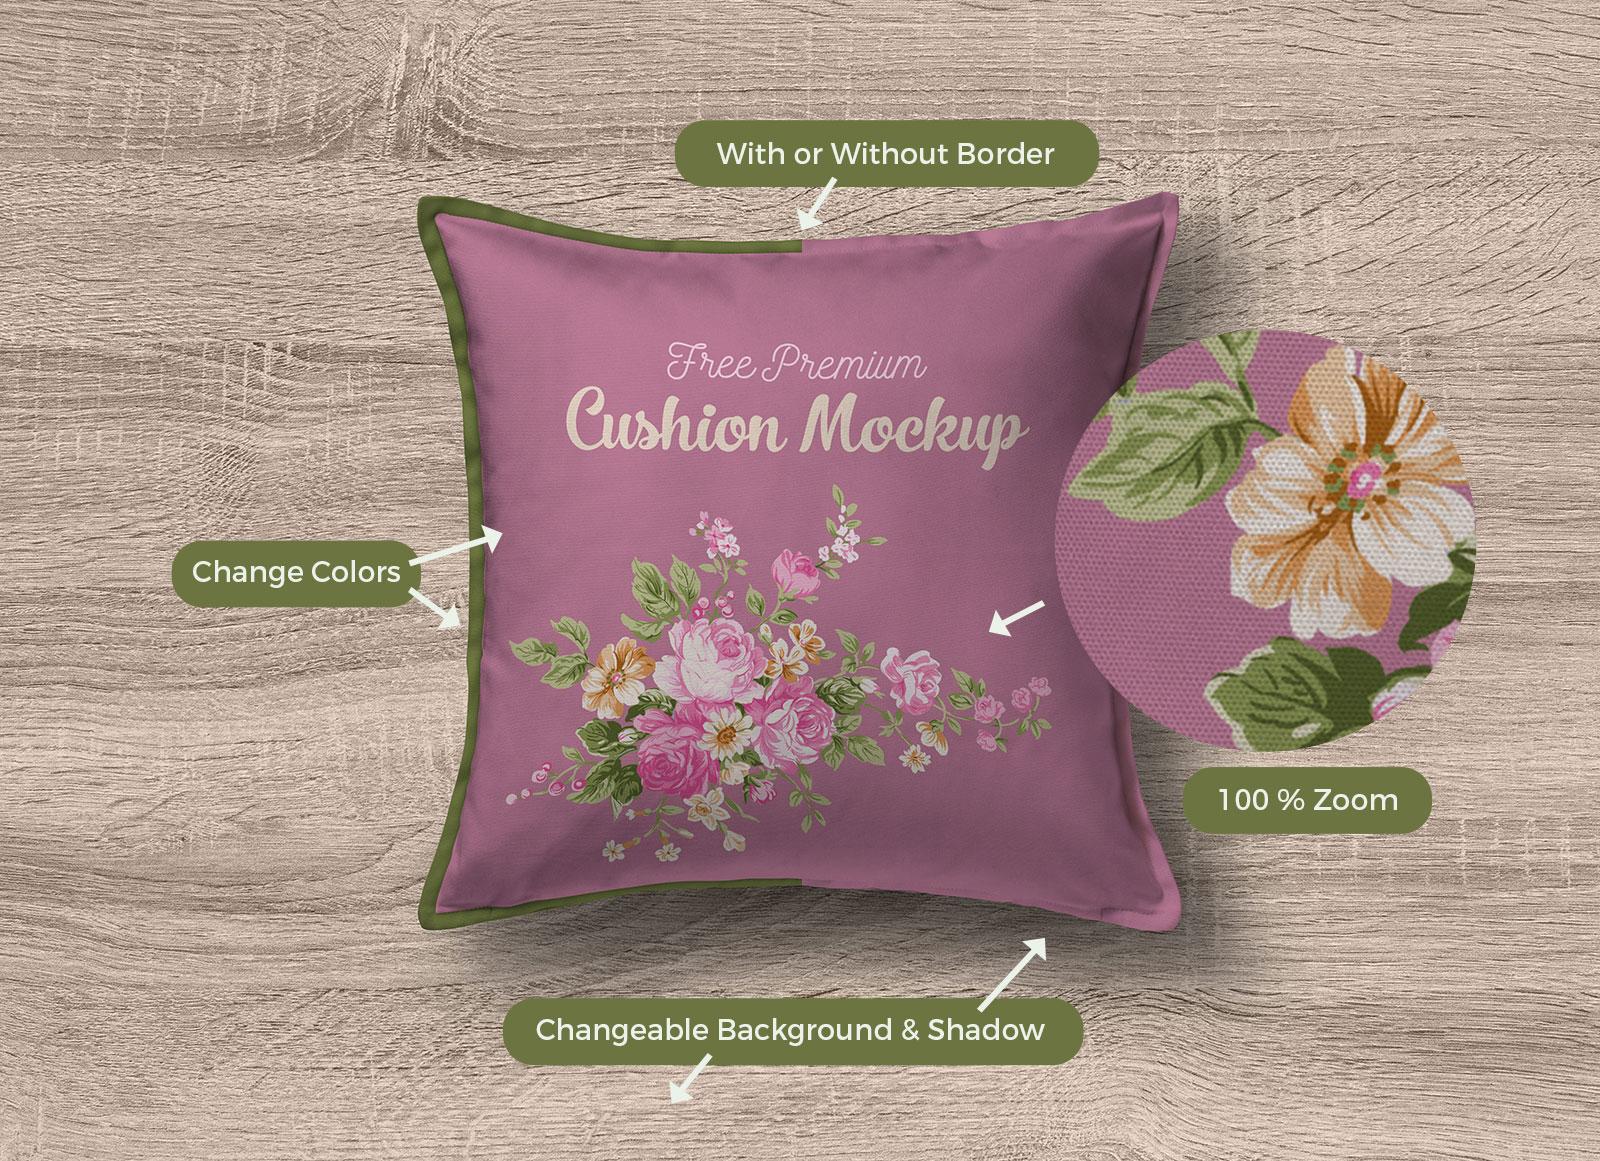 Free-Premium-Pillow-Cushion-Mockup-PSD-File